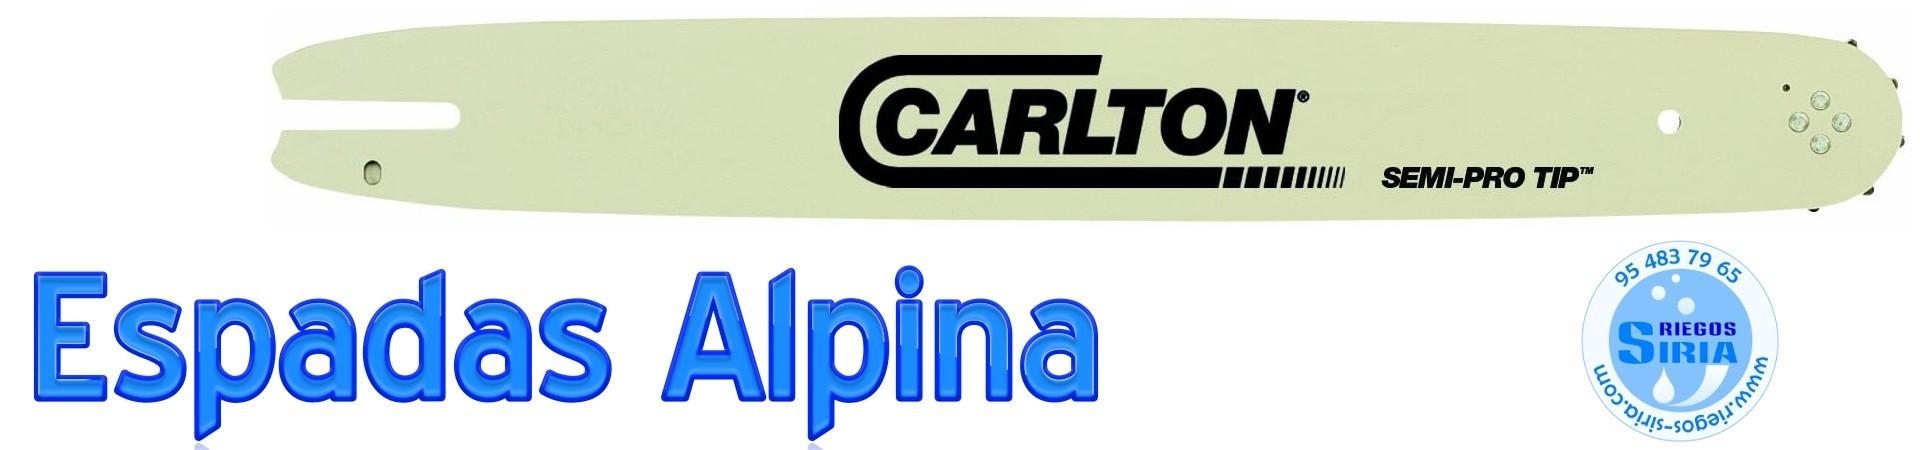 Espadas Alpina Dolmar